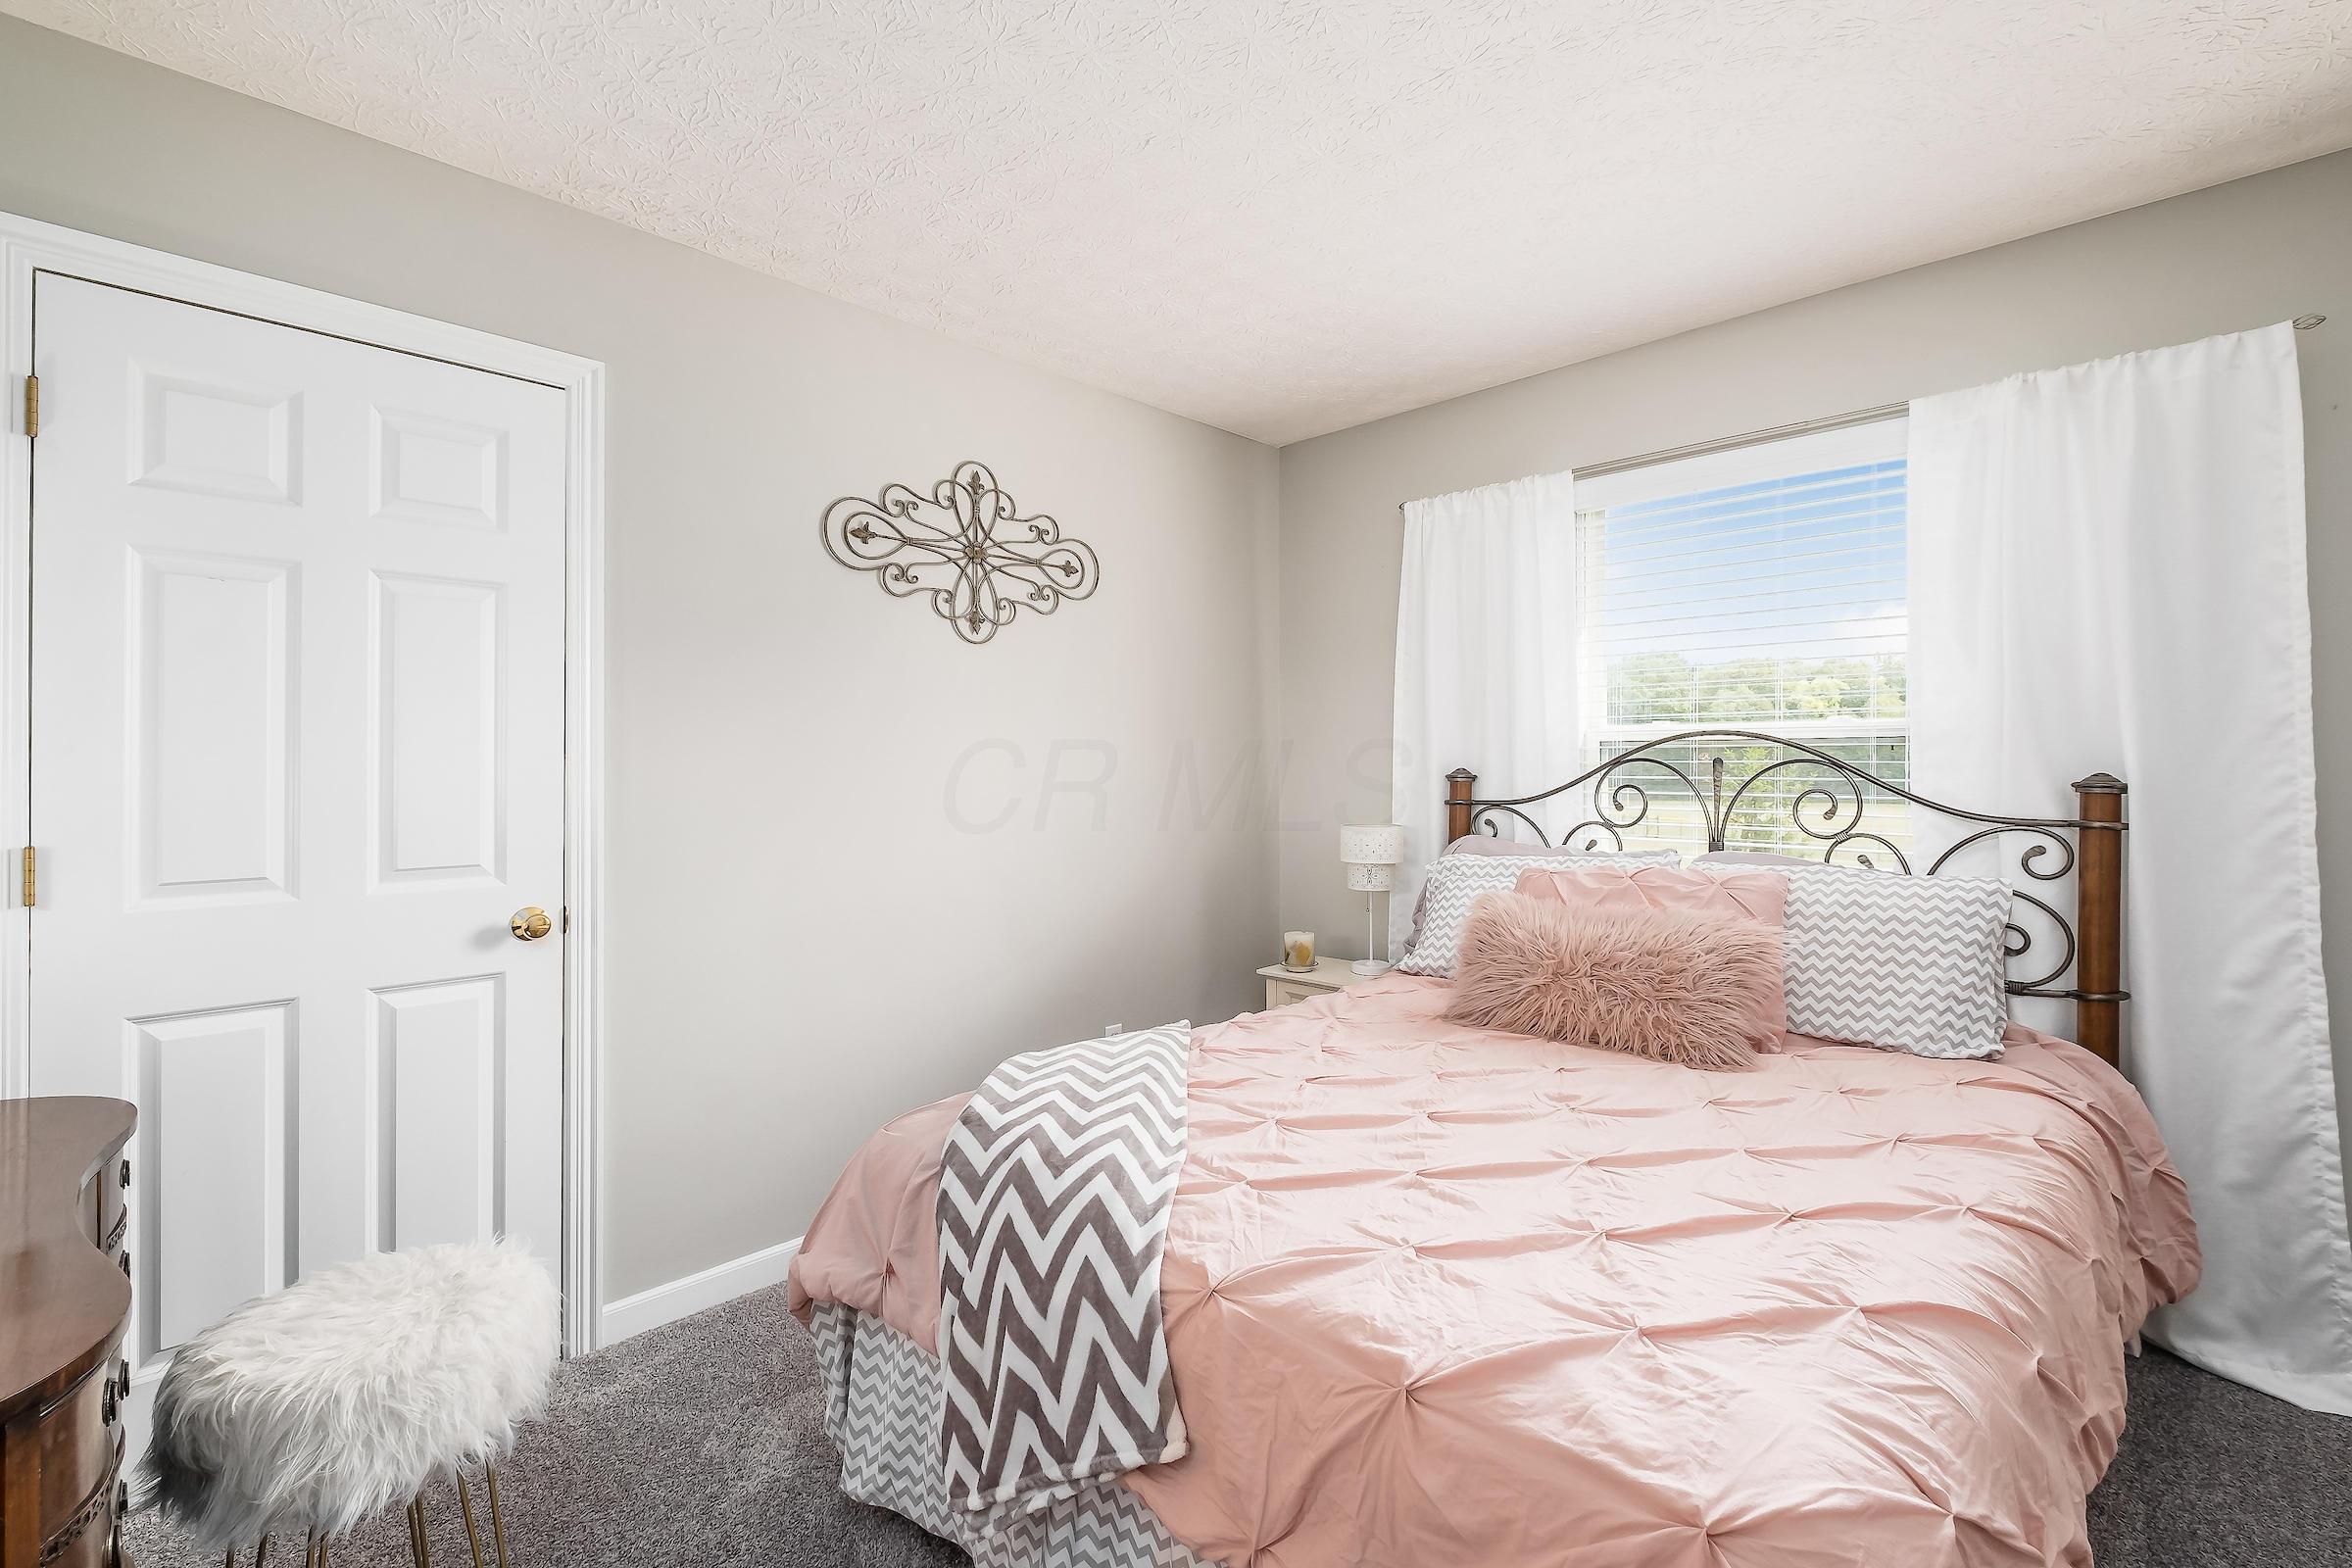 7322 Winnipeg Drive, Dublin, Ohio 43016, 4 Bedrooms Bedrooms, ,3 BathroomsBathrooms,Residential,For Sale,Winnipeg,220031554